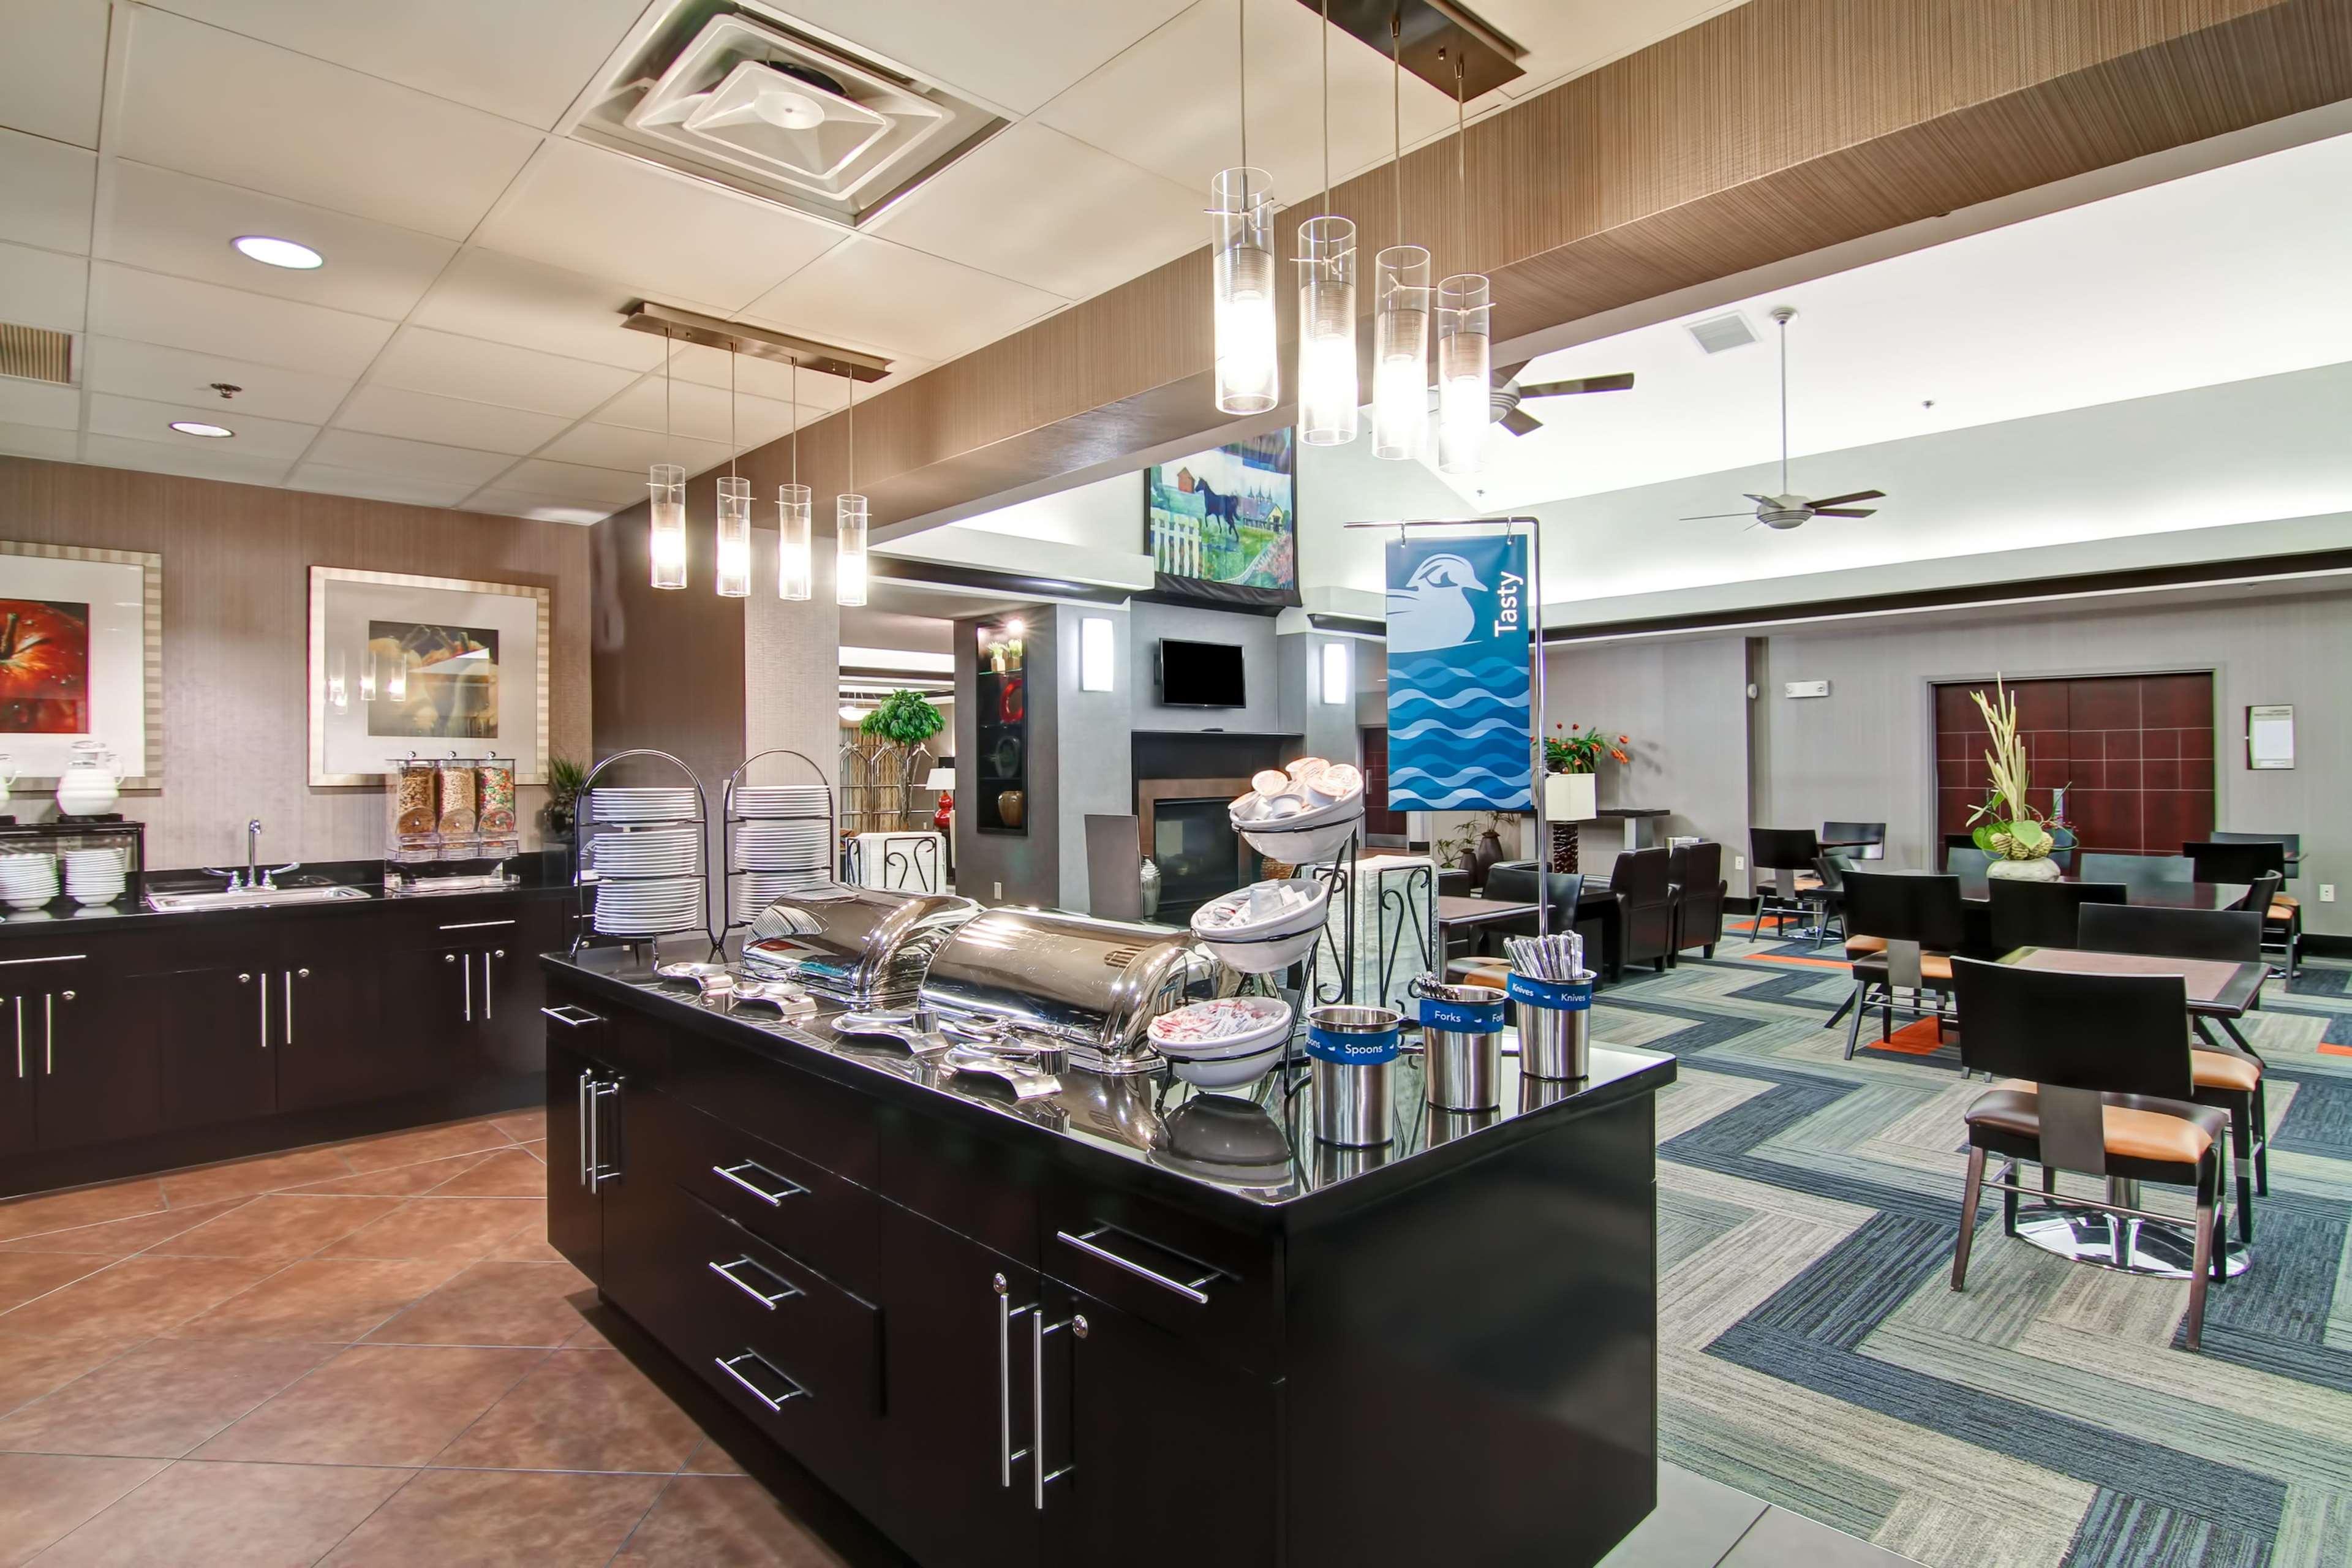 Homewood Suites by Hilton Cincinnati Airport South-Florence image 11